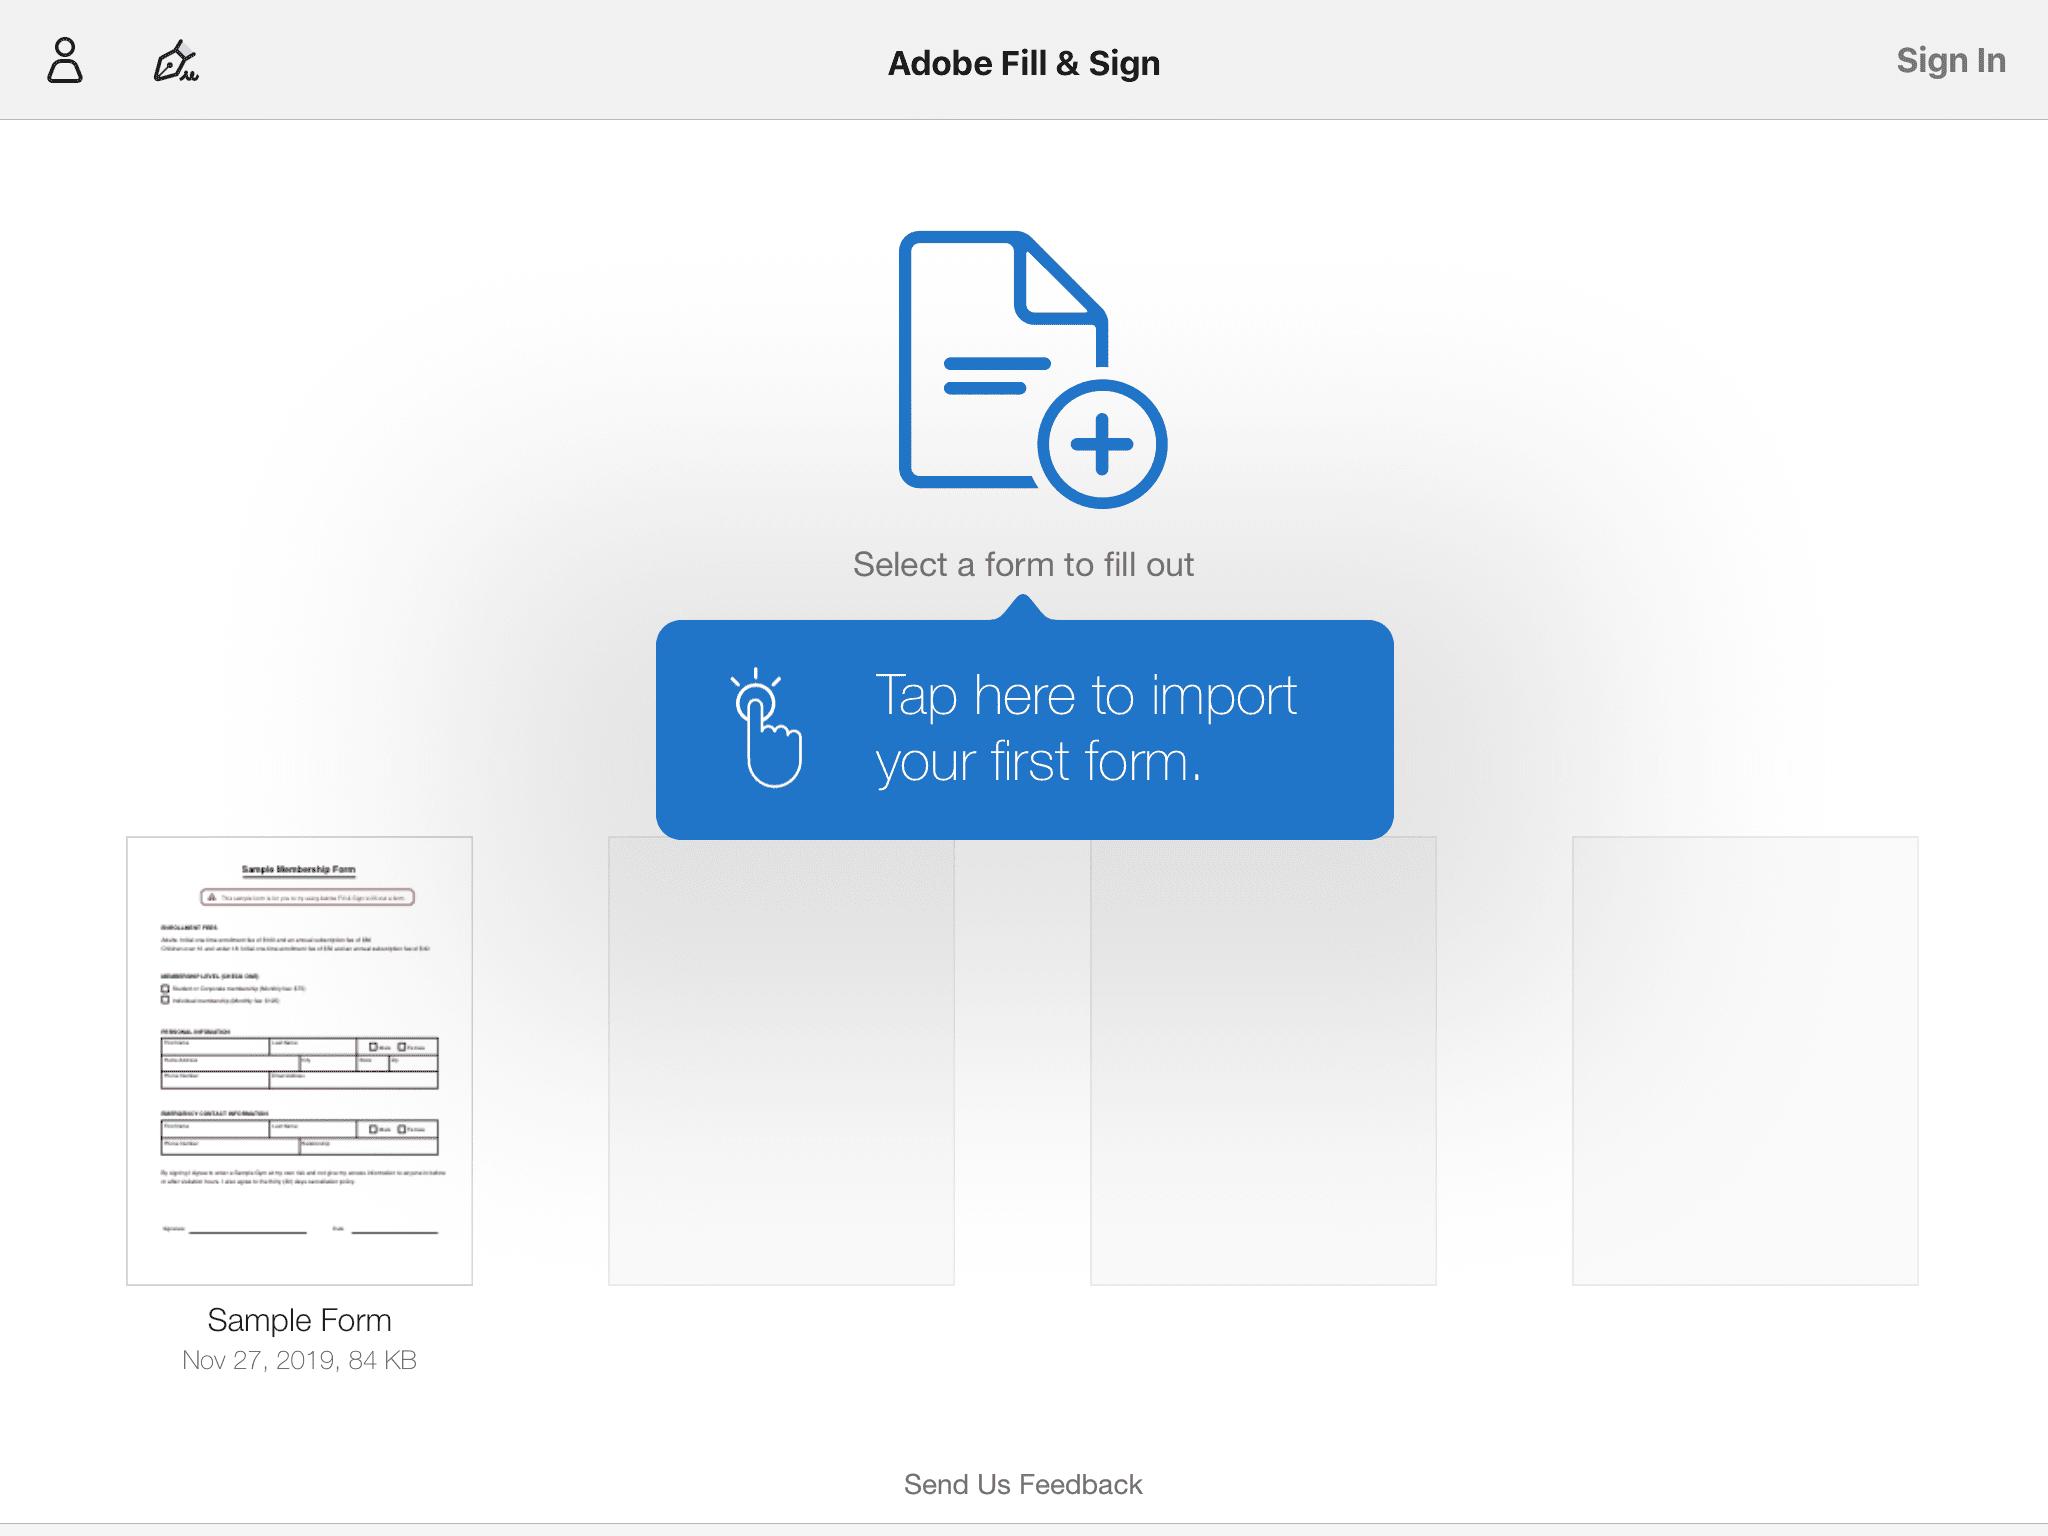 Adding a PDF to Adobe Fill & Sign